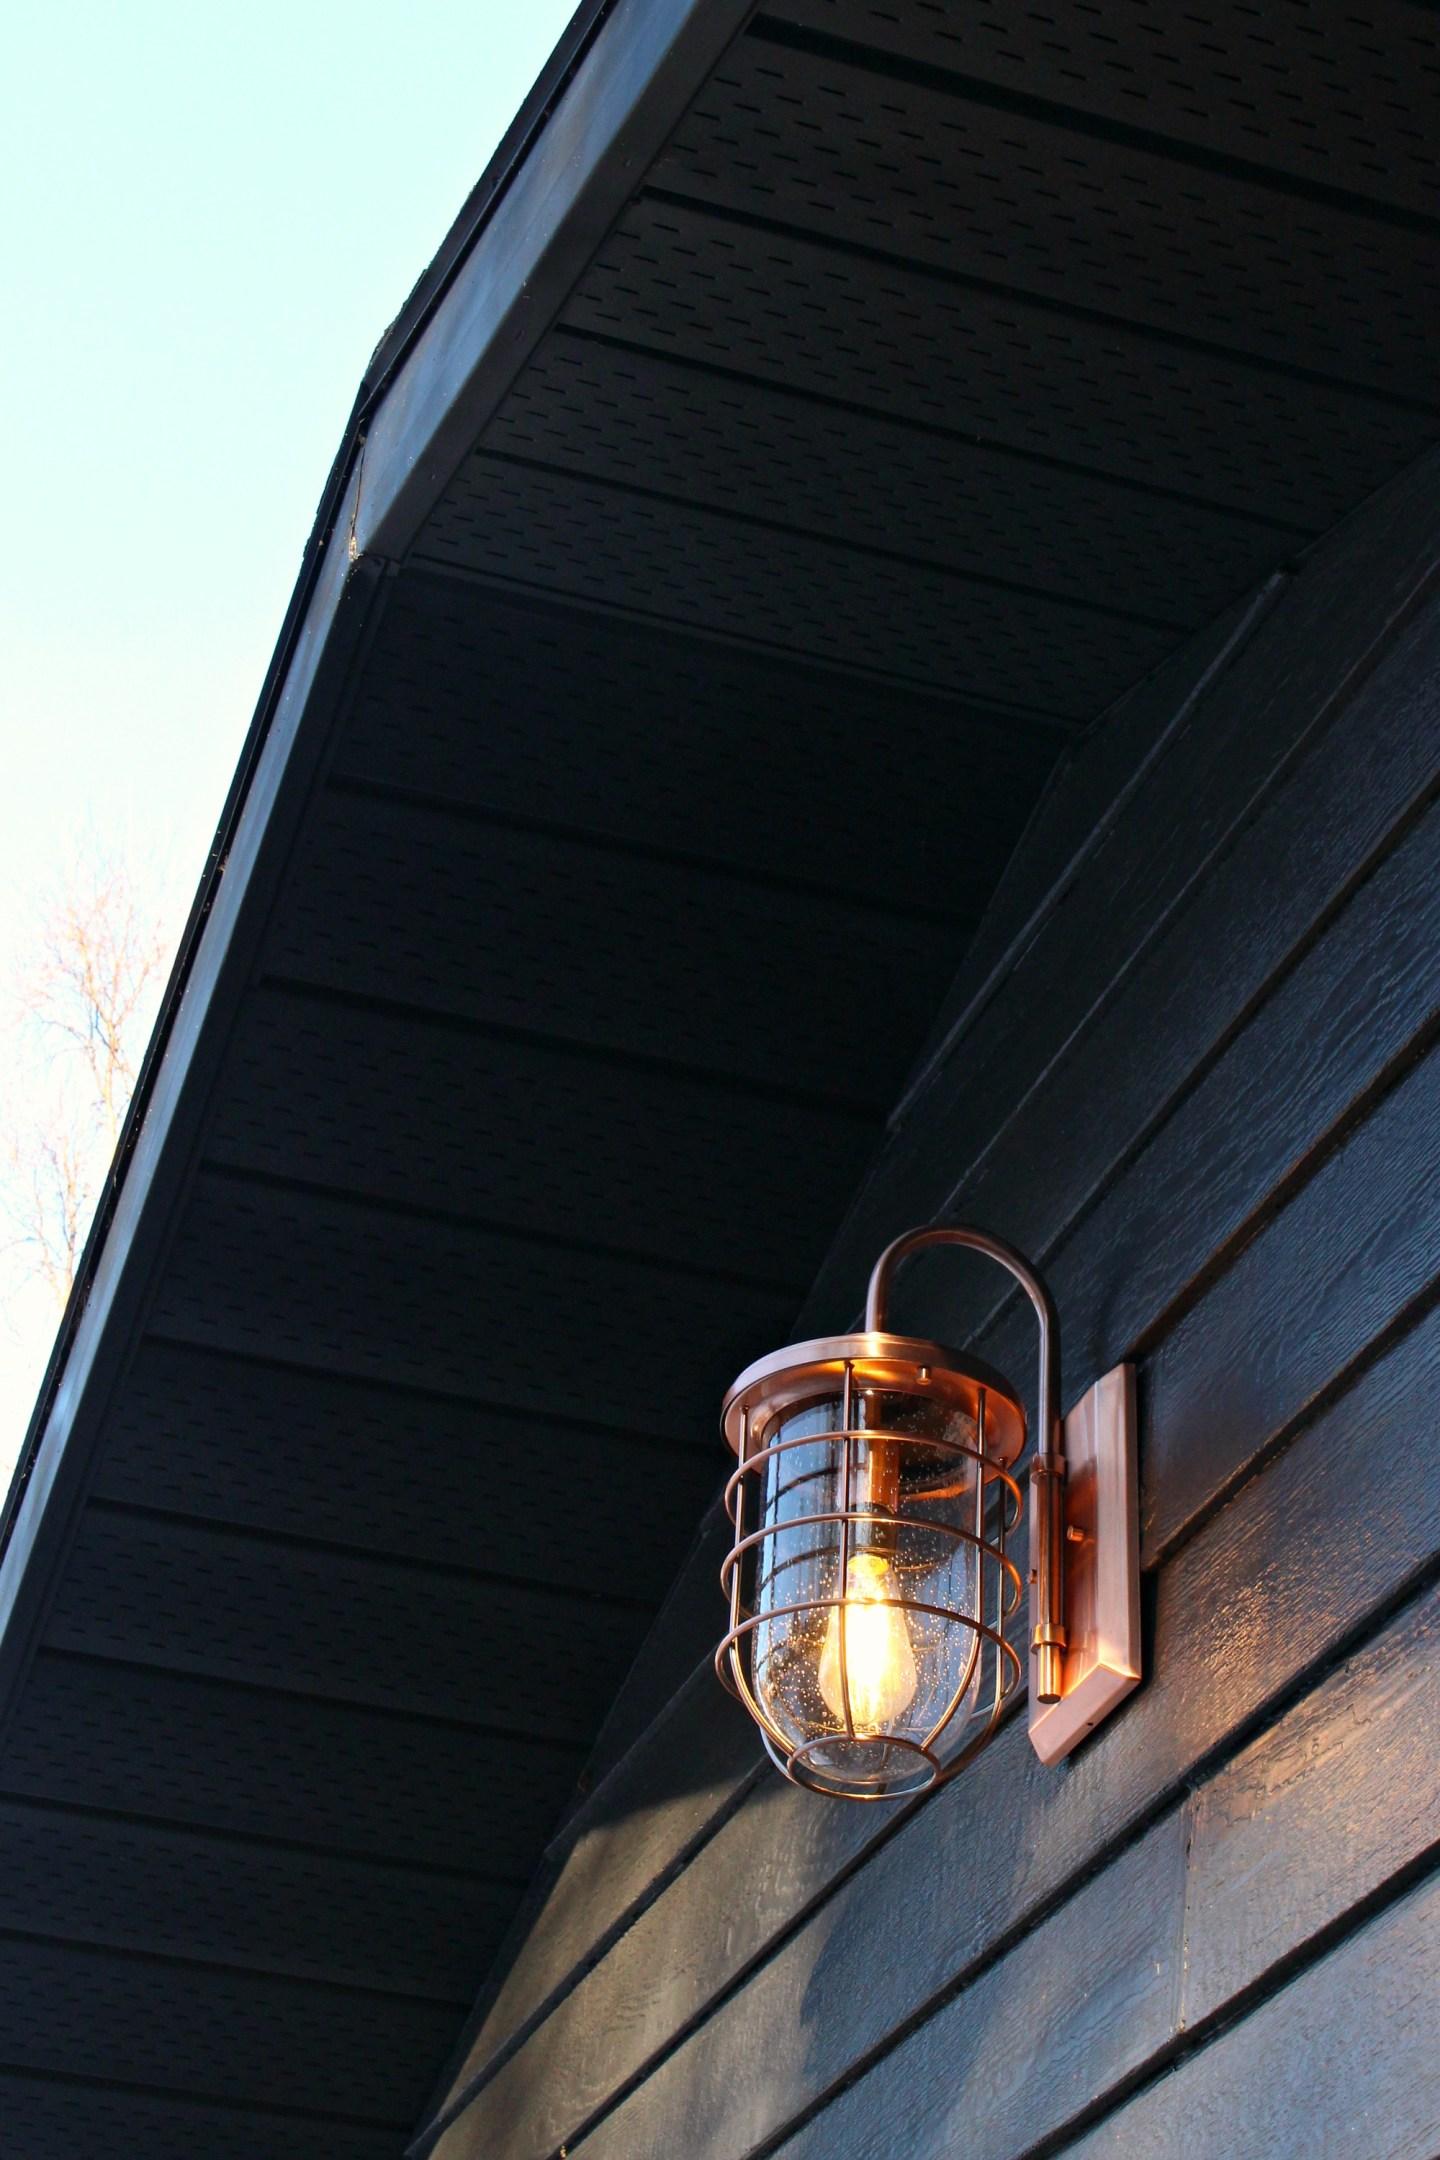 New Copper Outdoor Lights | Garage Makeover Before & After